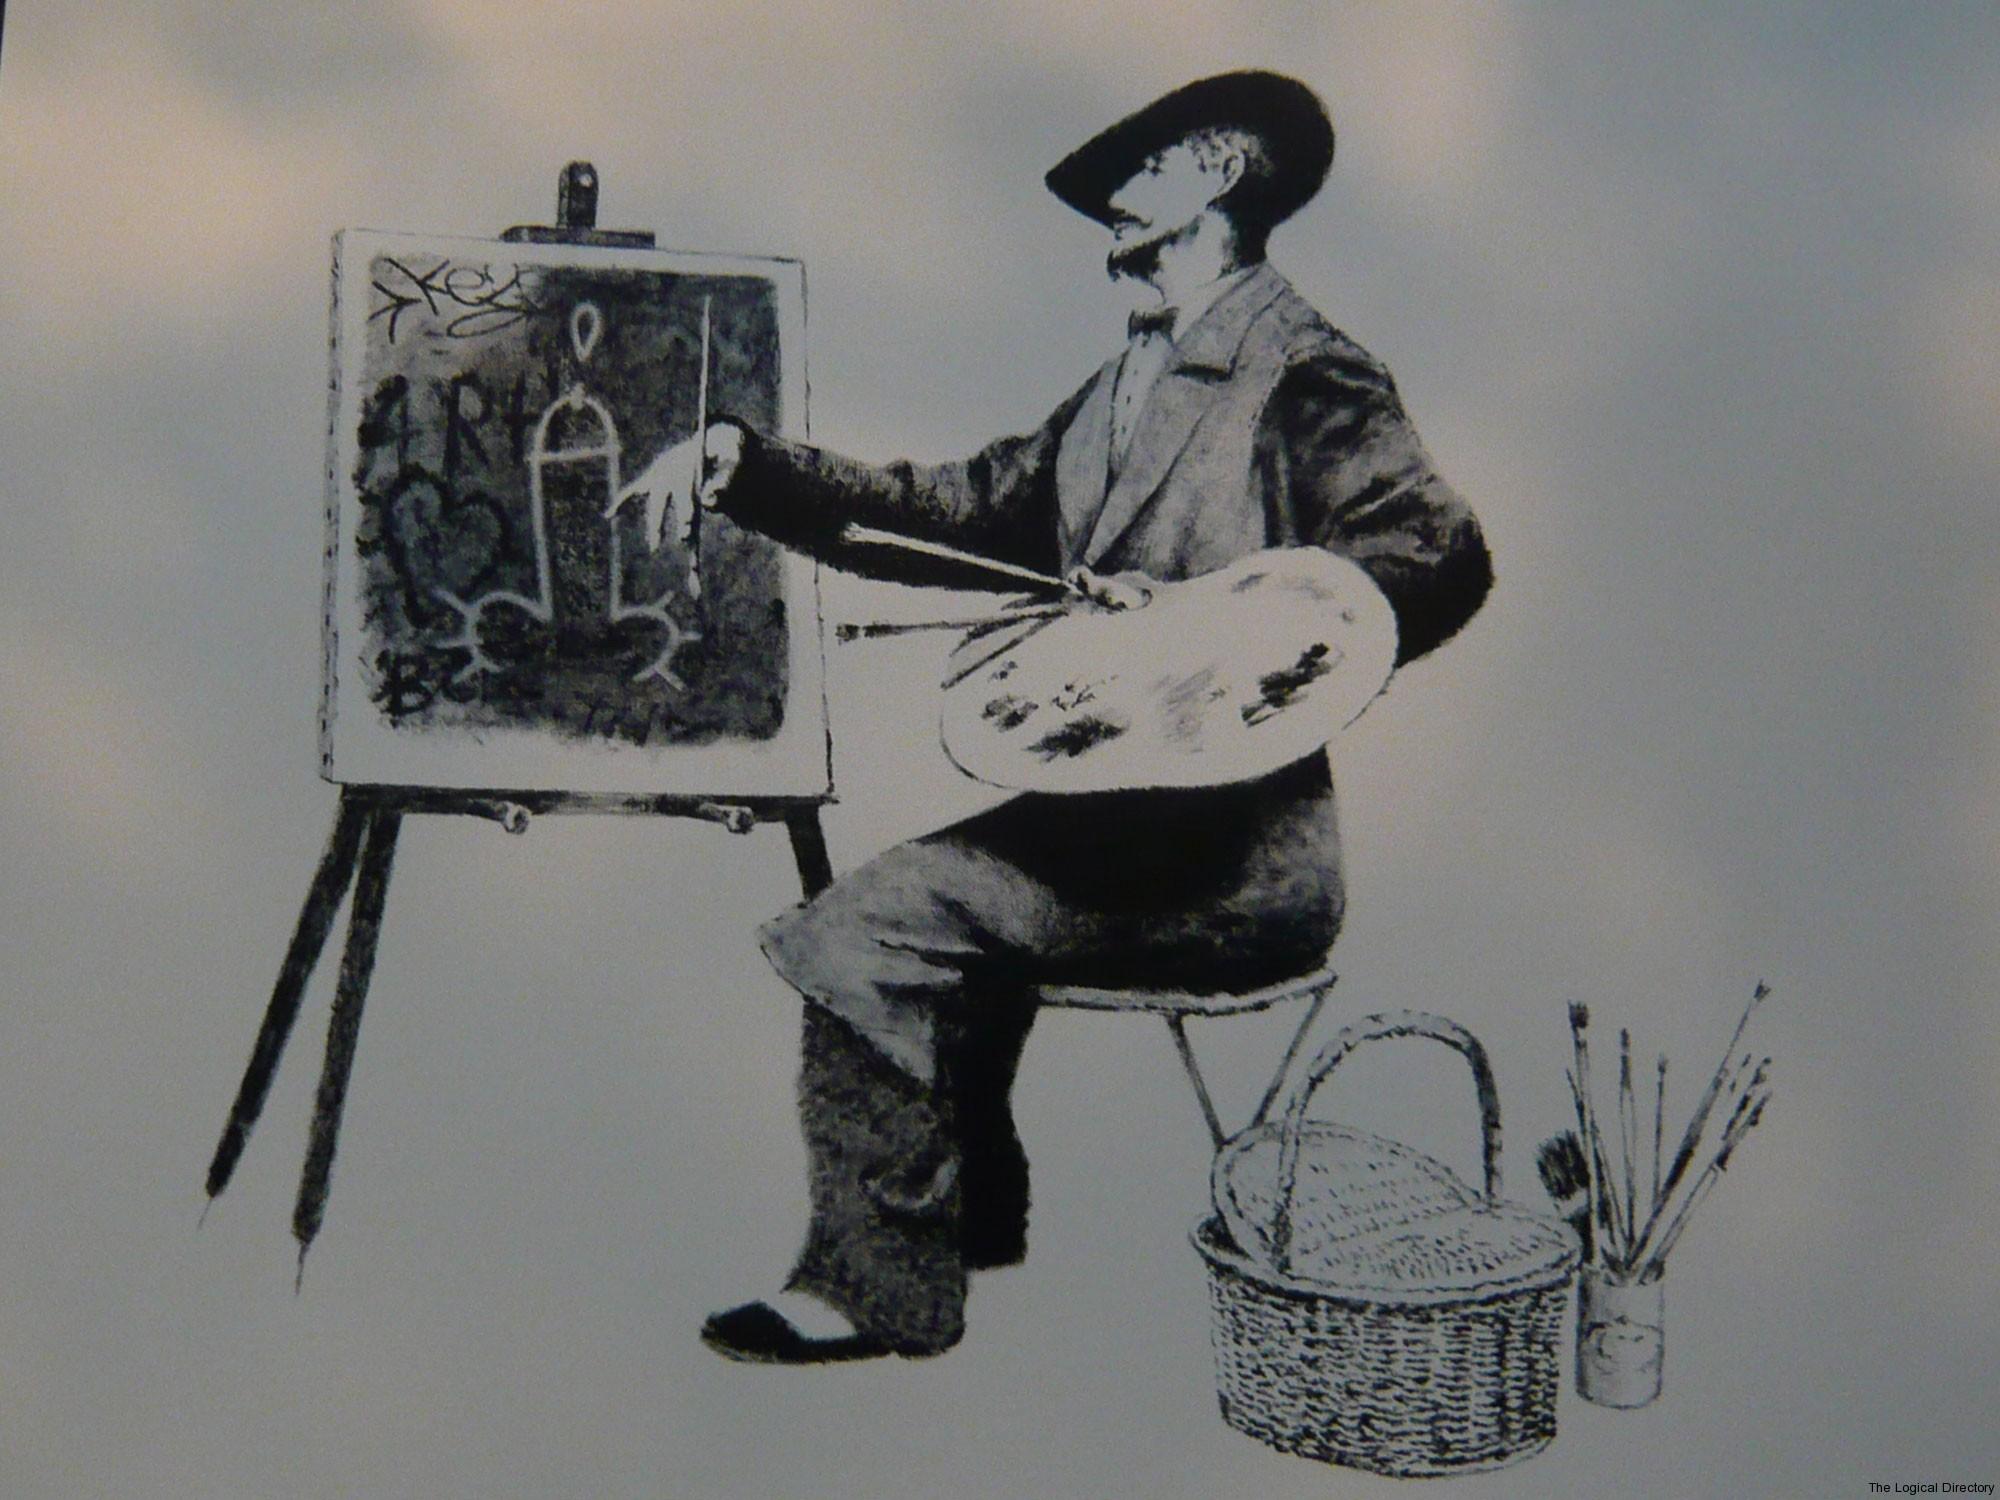 Banksy - Modern Day Masterpiece